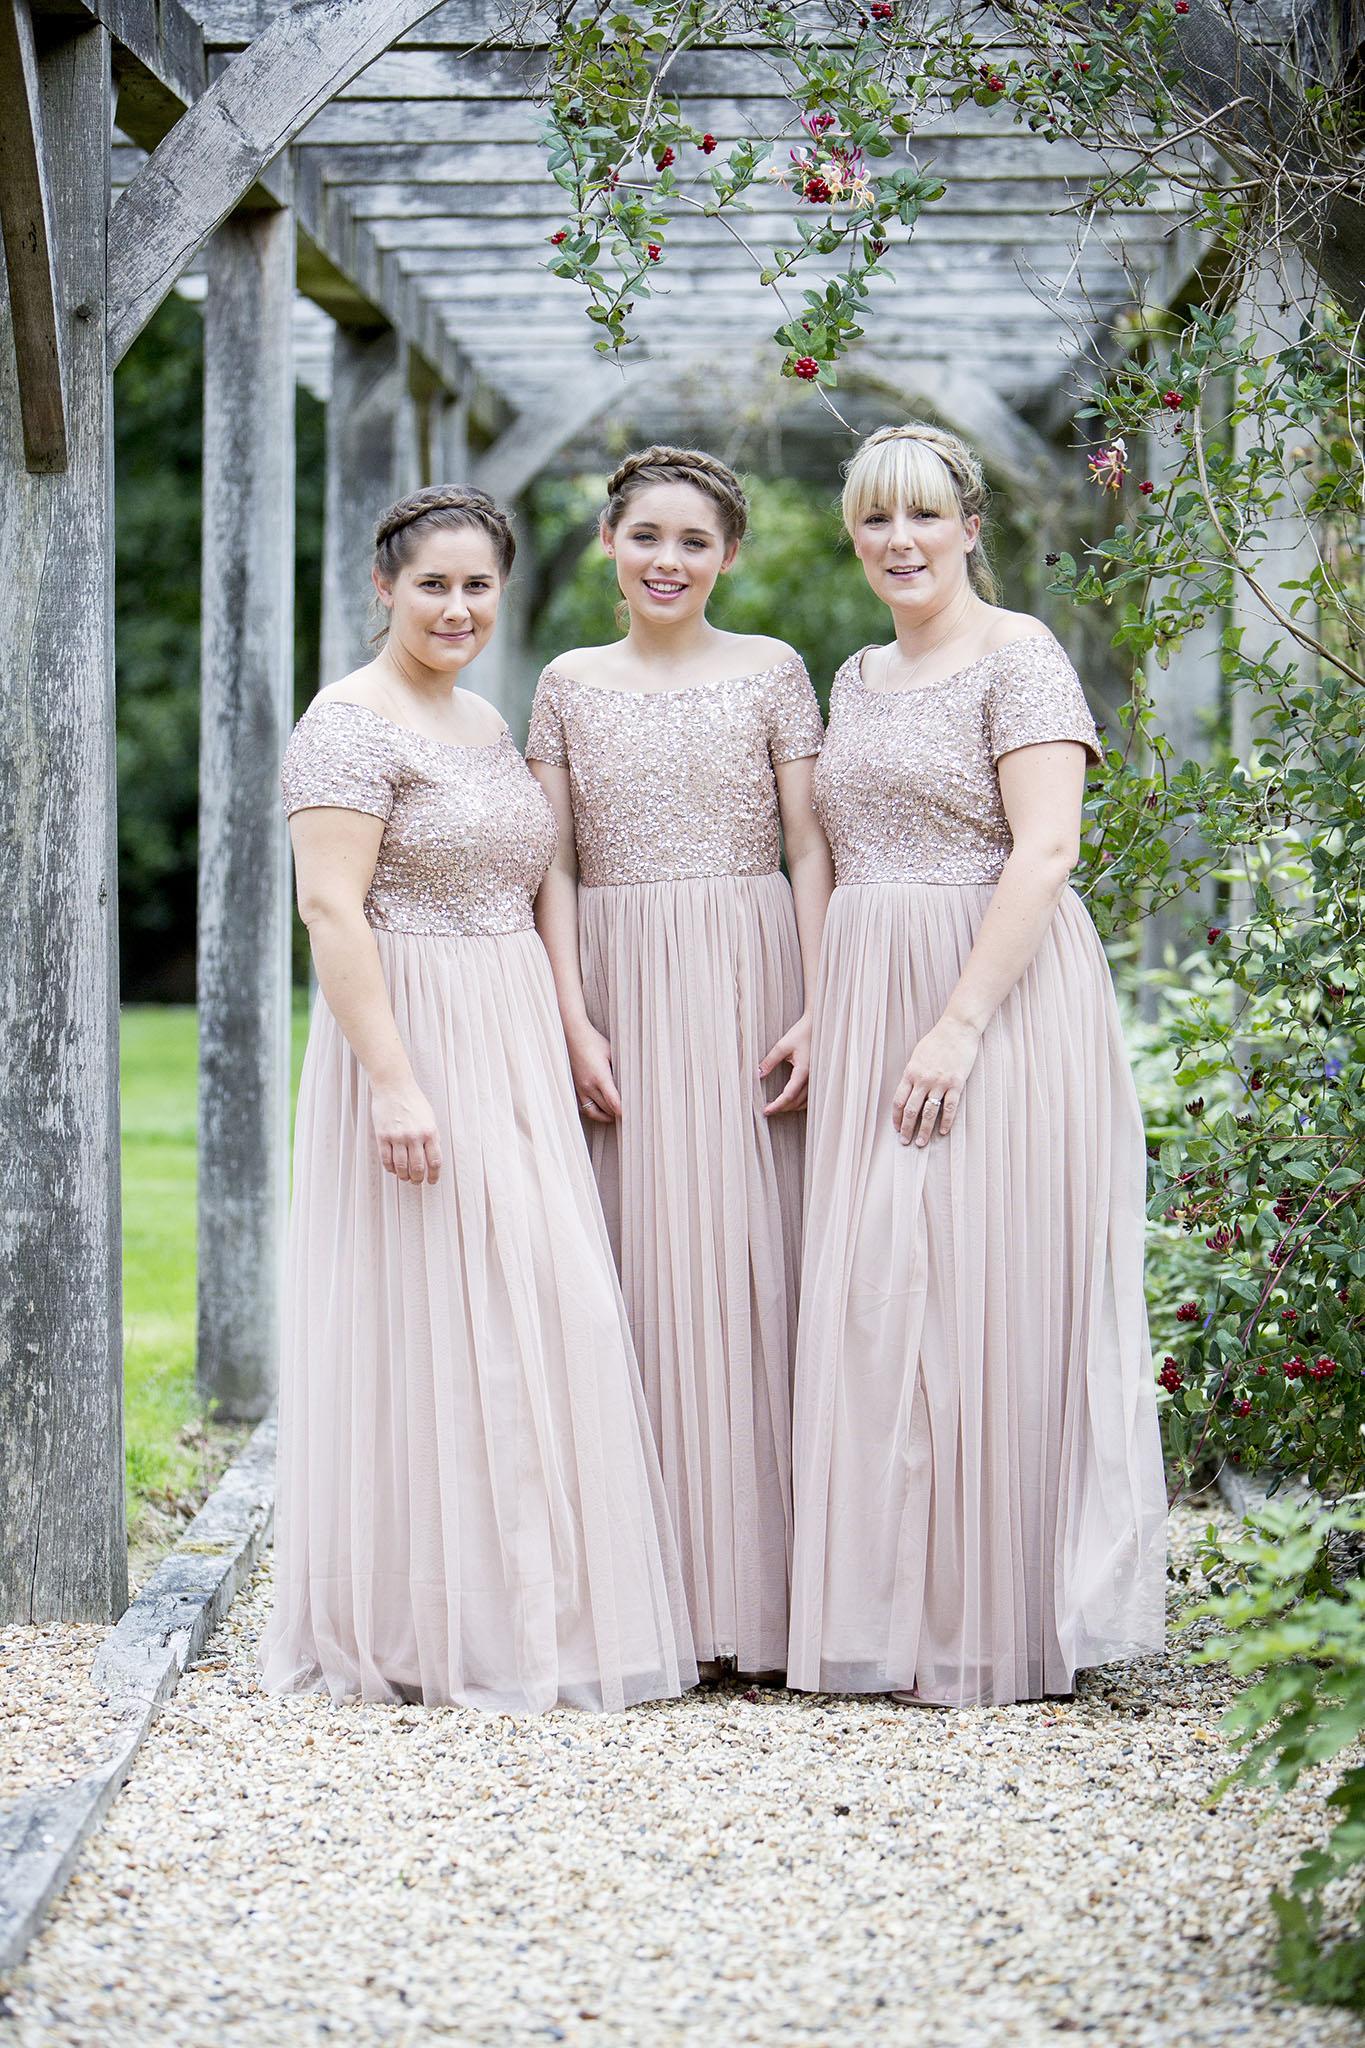 elizabethgphotography_kingslangley_hertfordshire_fineart_wedding_tewinbury_farm_tayna_08.jpg